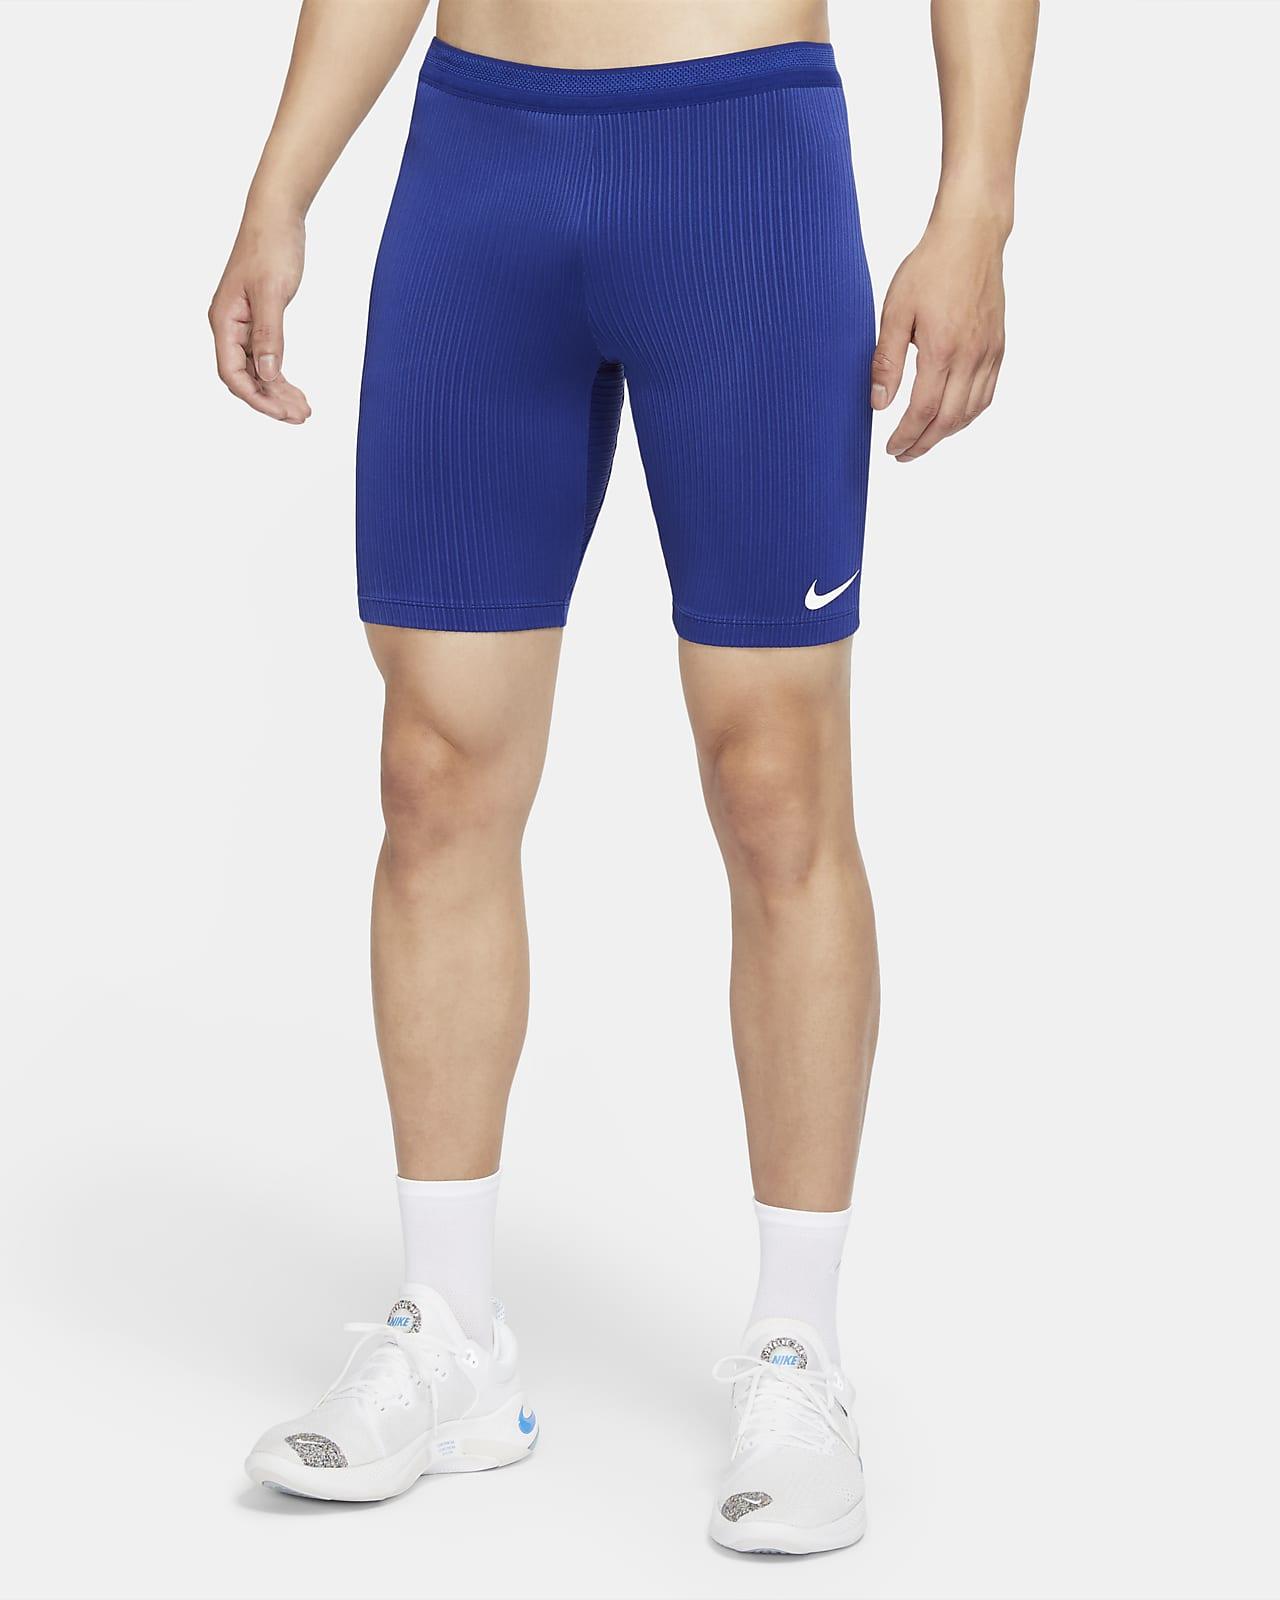 Halvlånga tävlingstights Nike Dri-FIT ADV Team USA AeroSwift för män